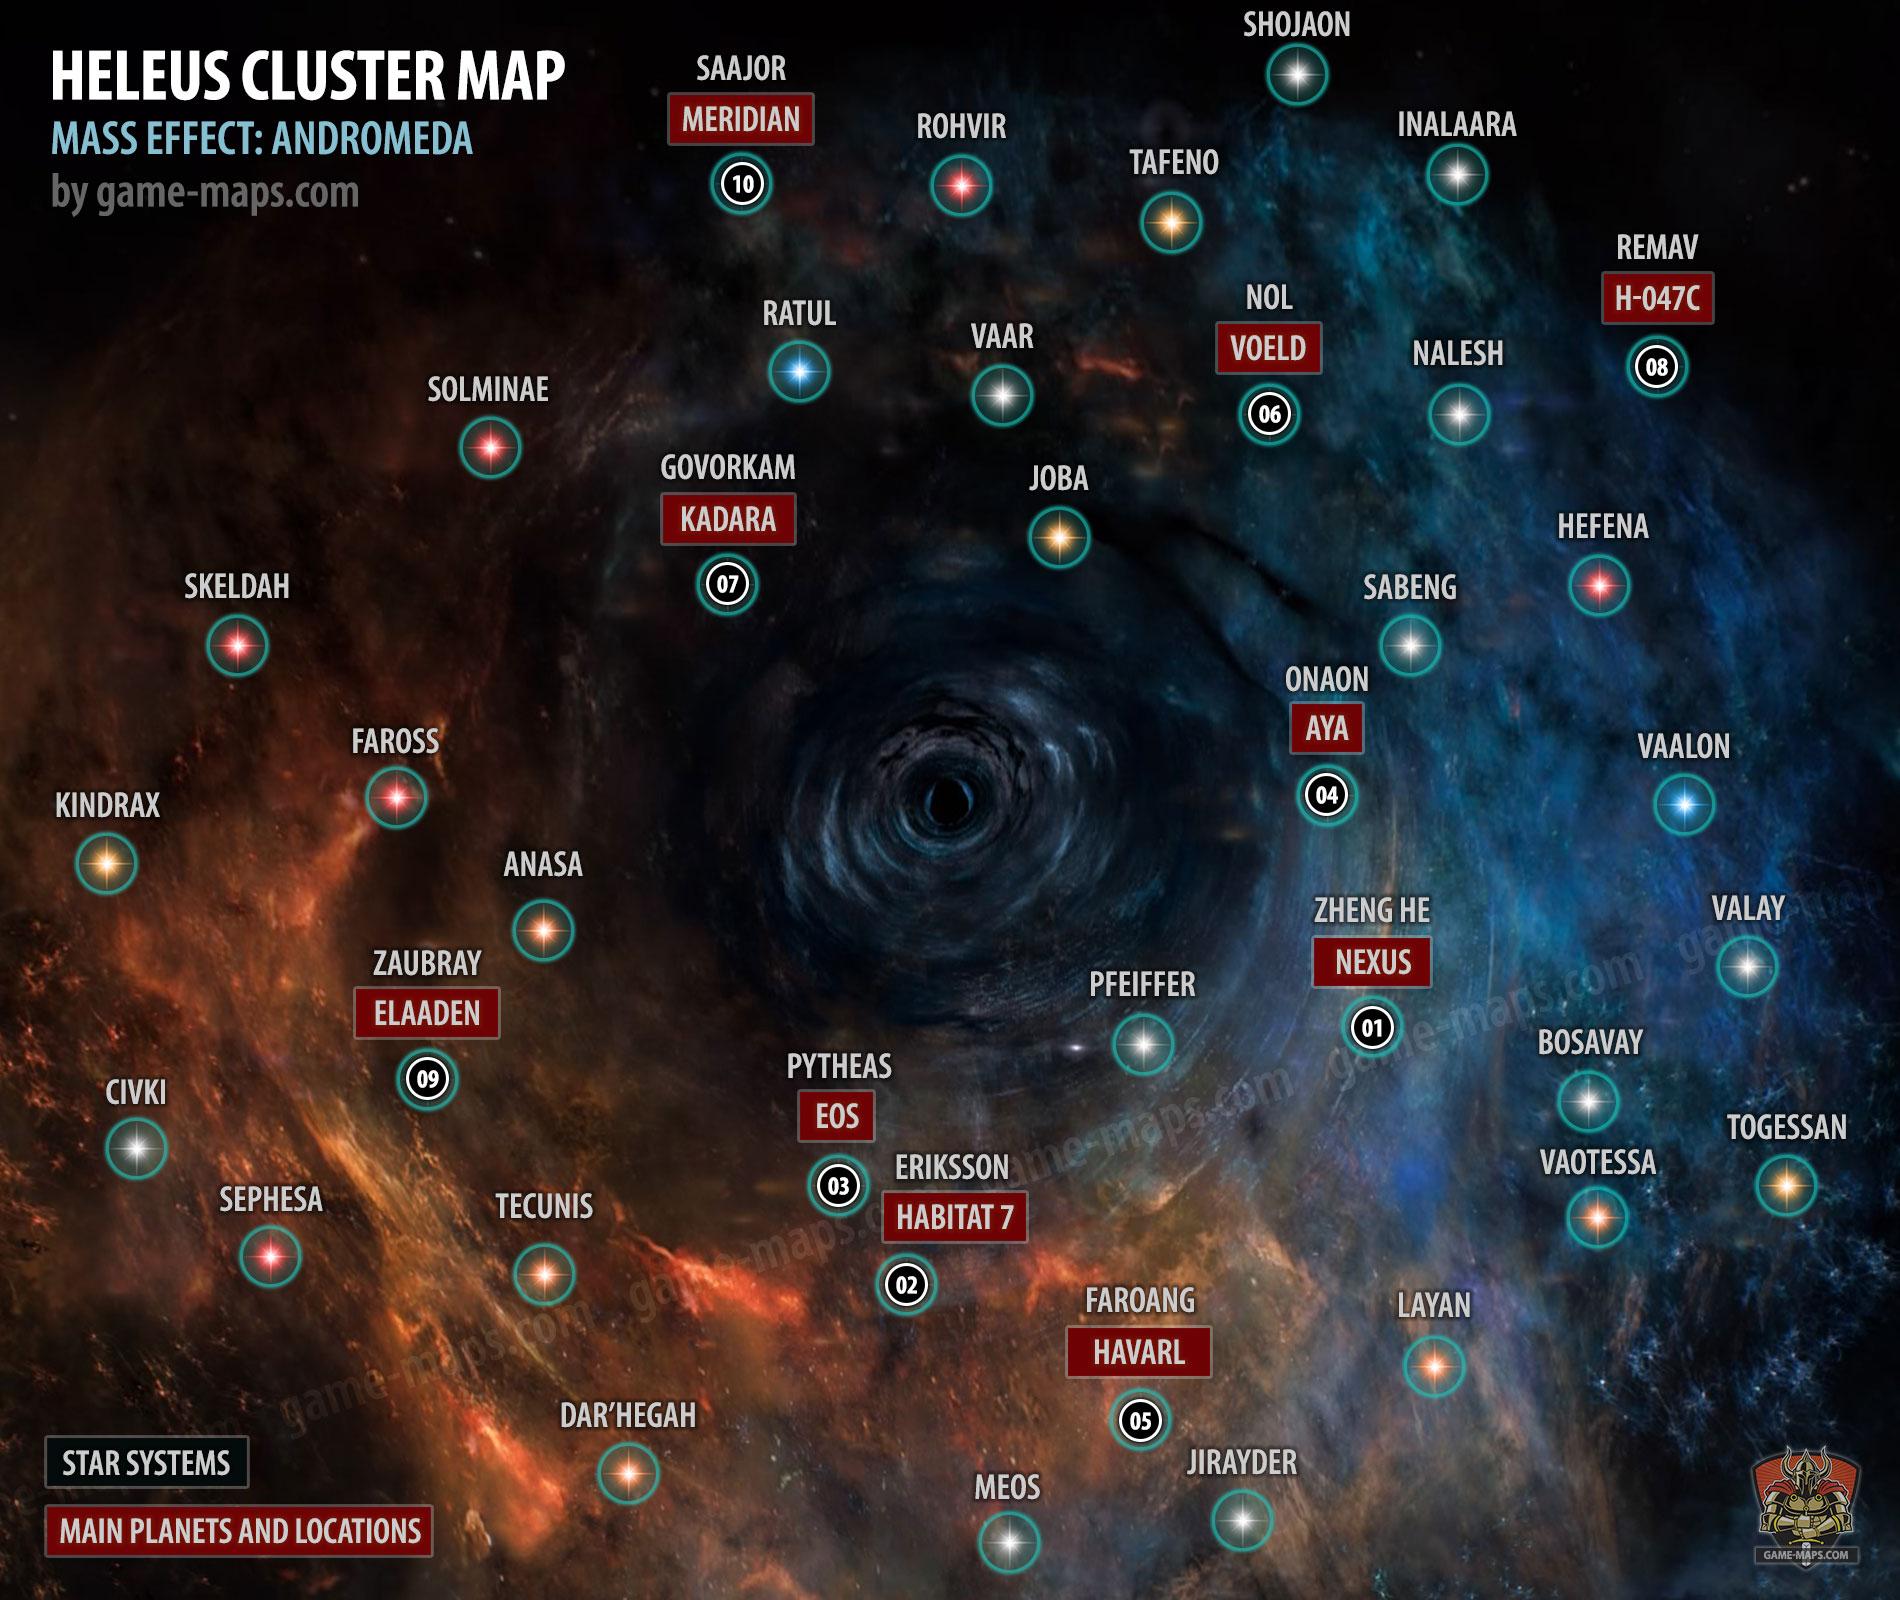 Mass Effect Star Map.Heleus Cluster Map Mass Effect Andromeda Game Maps Com